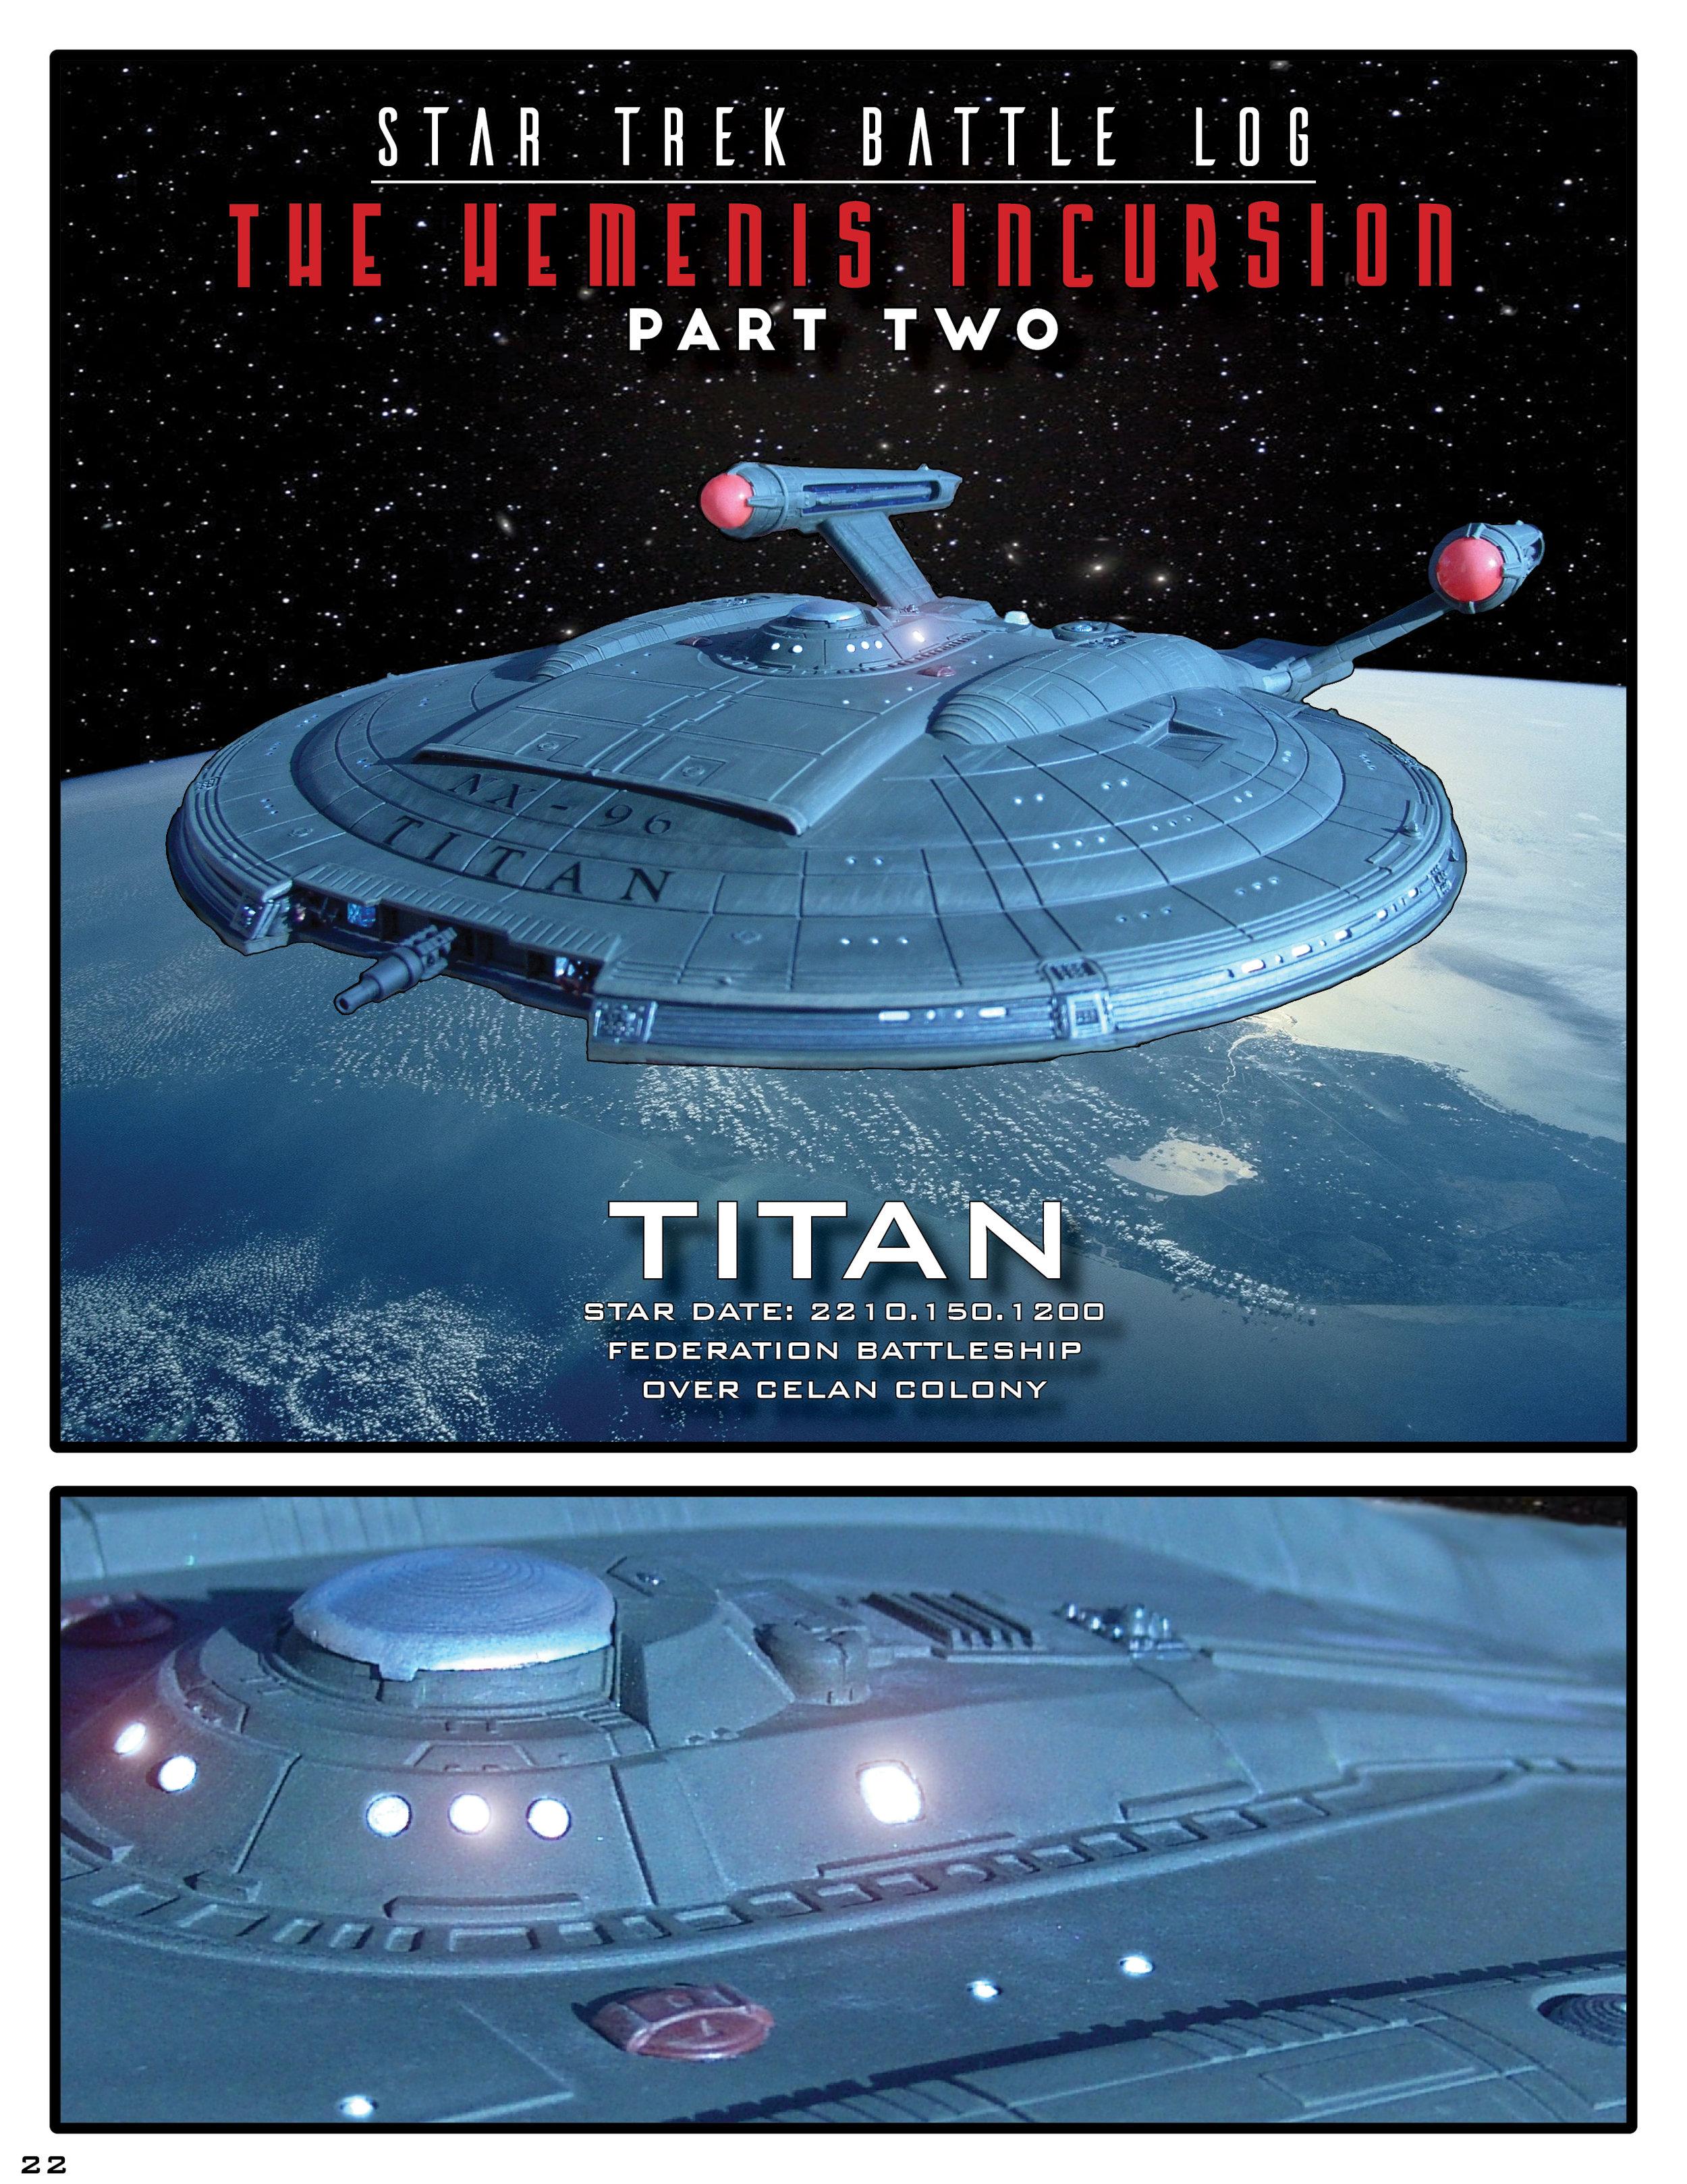 Star Trek_ Battle Logs Pages22.jpg